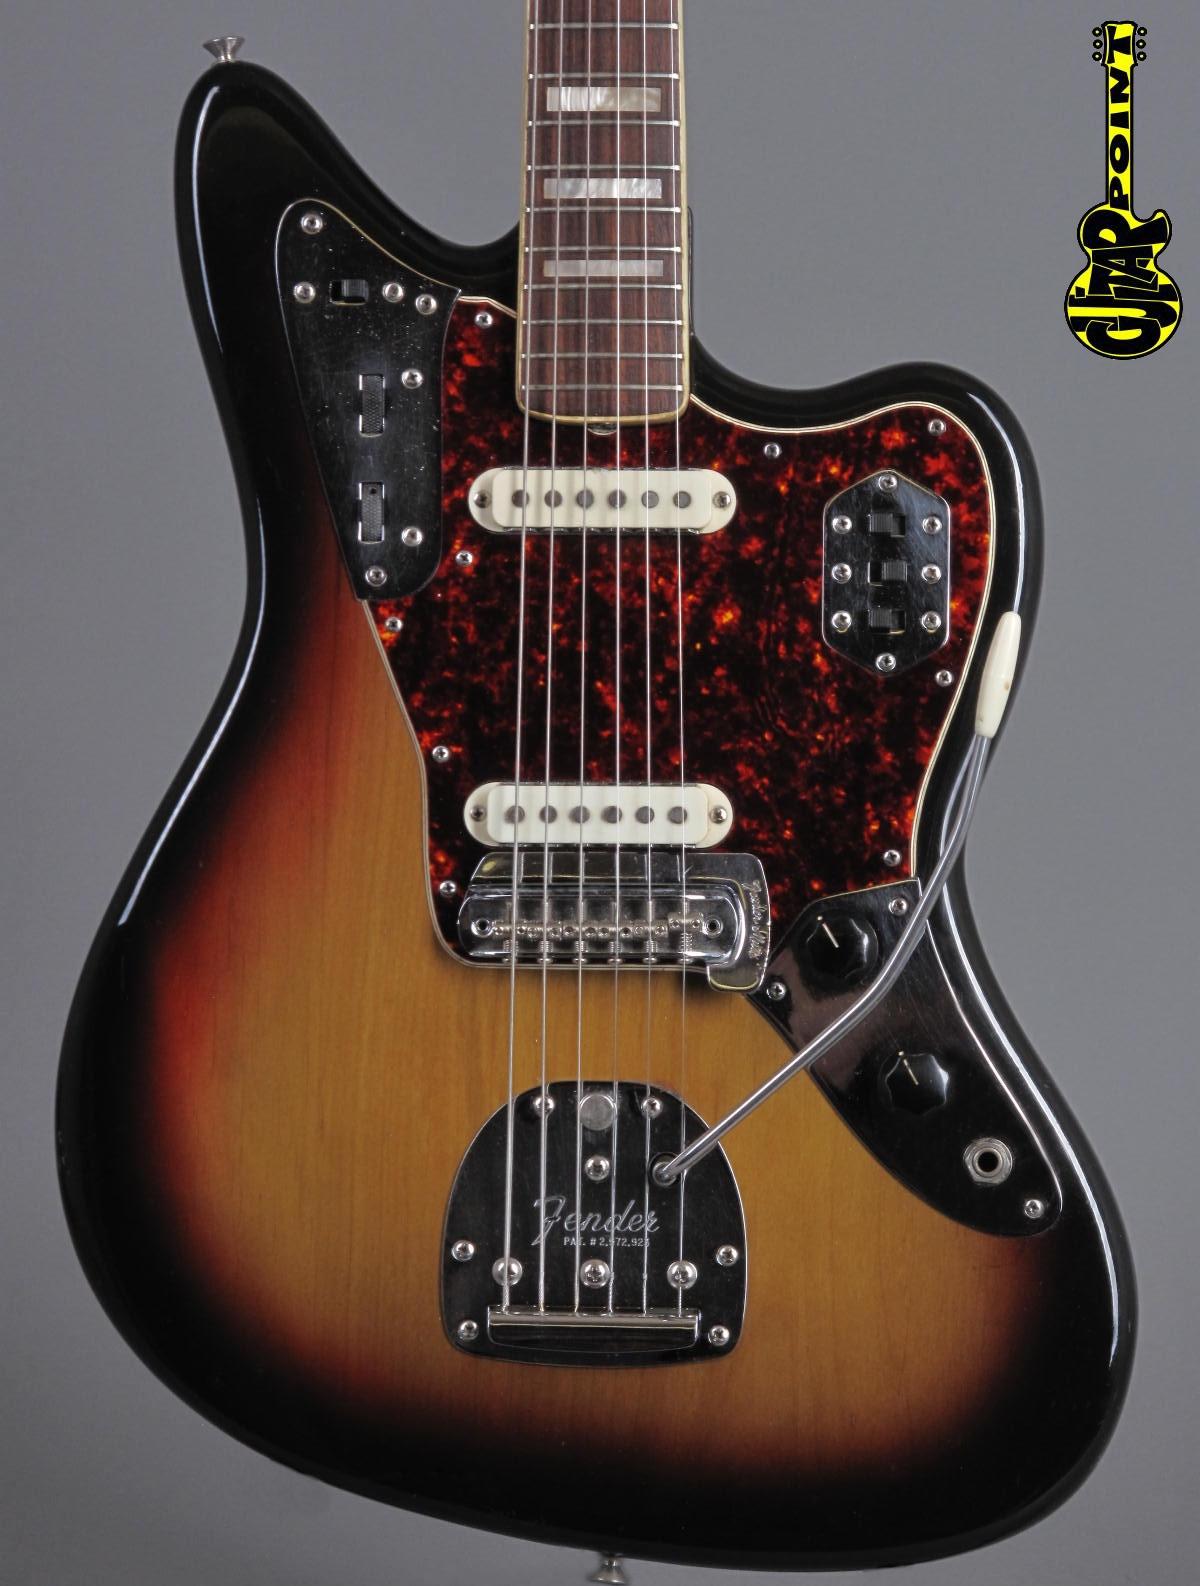 1973 Fender Jaguar – 3-tone Sunburst